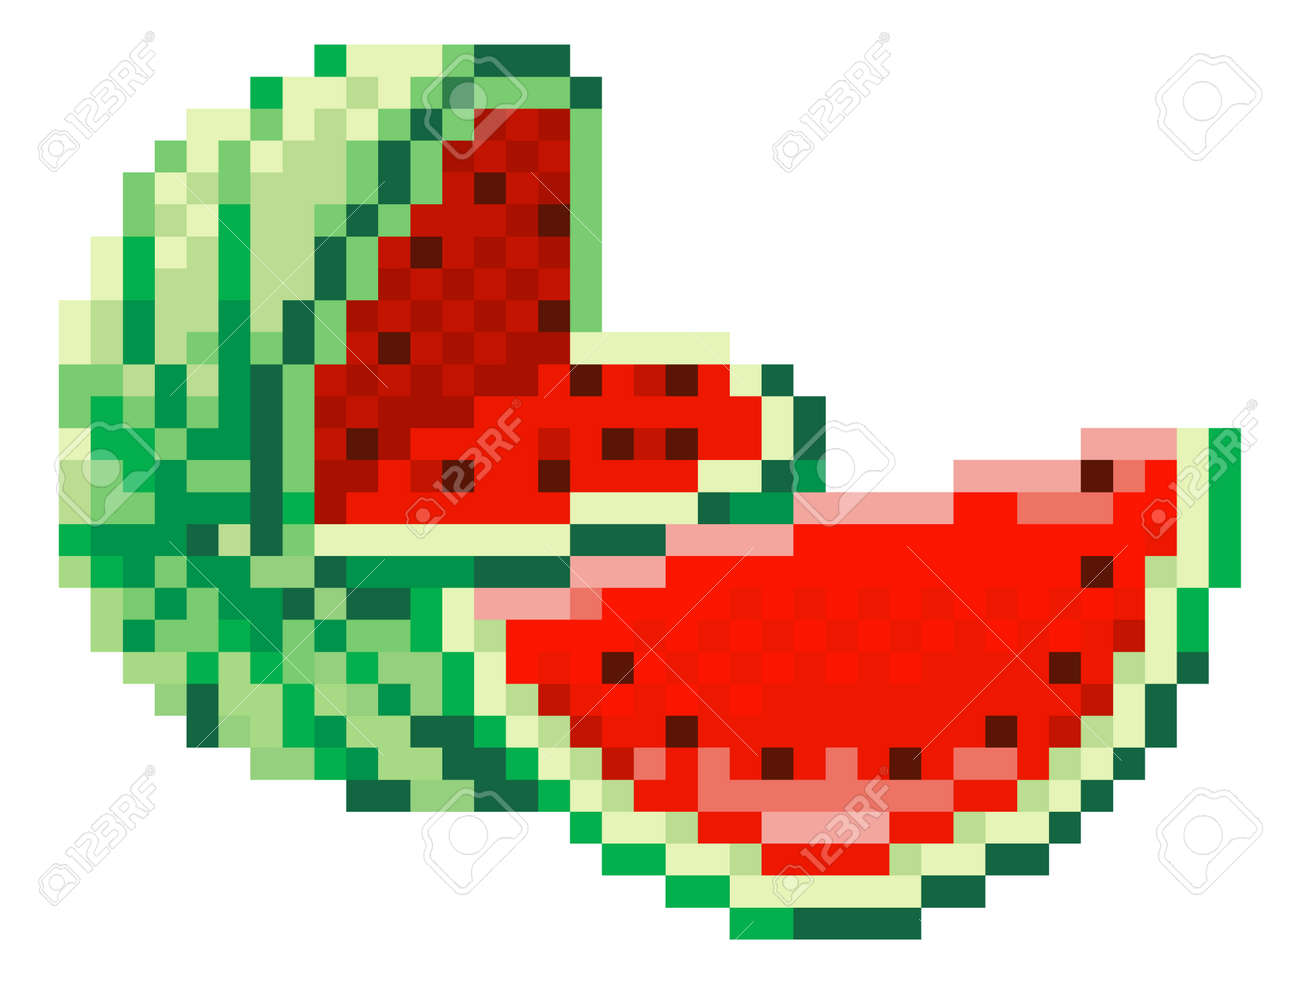 Watermelon Pixel Art